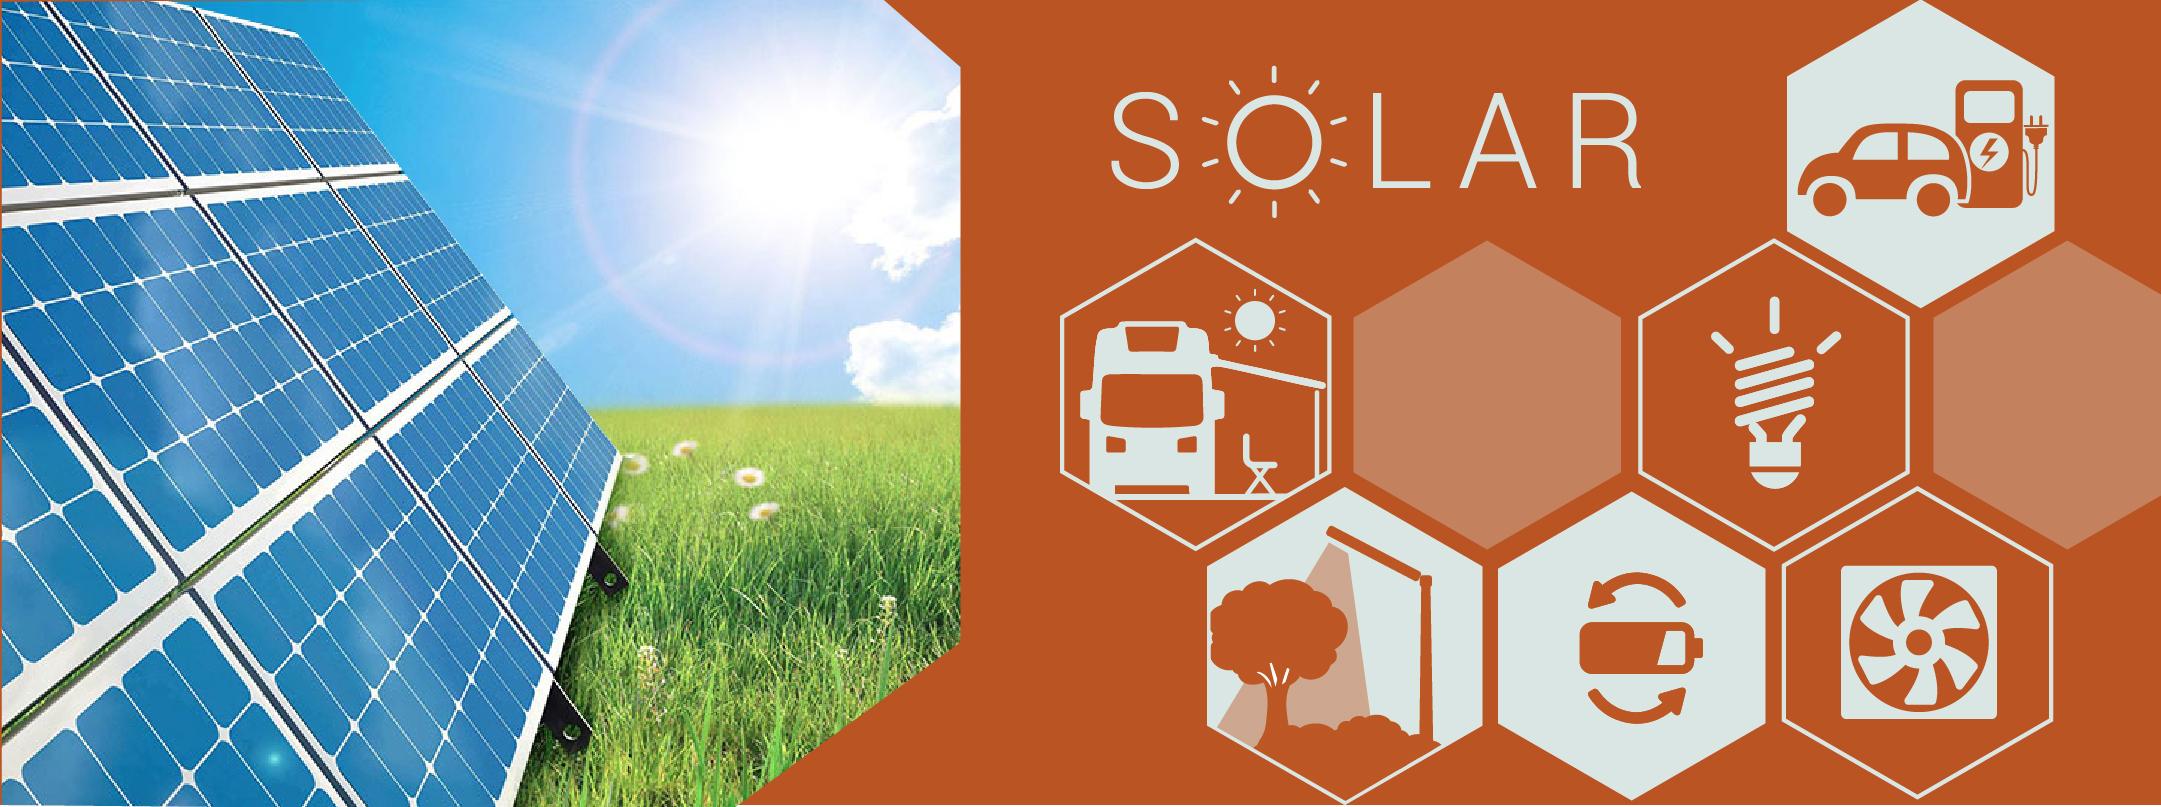 solar-latest-03.jpg